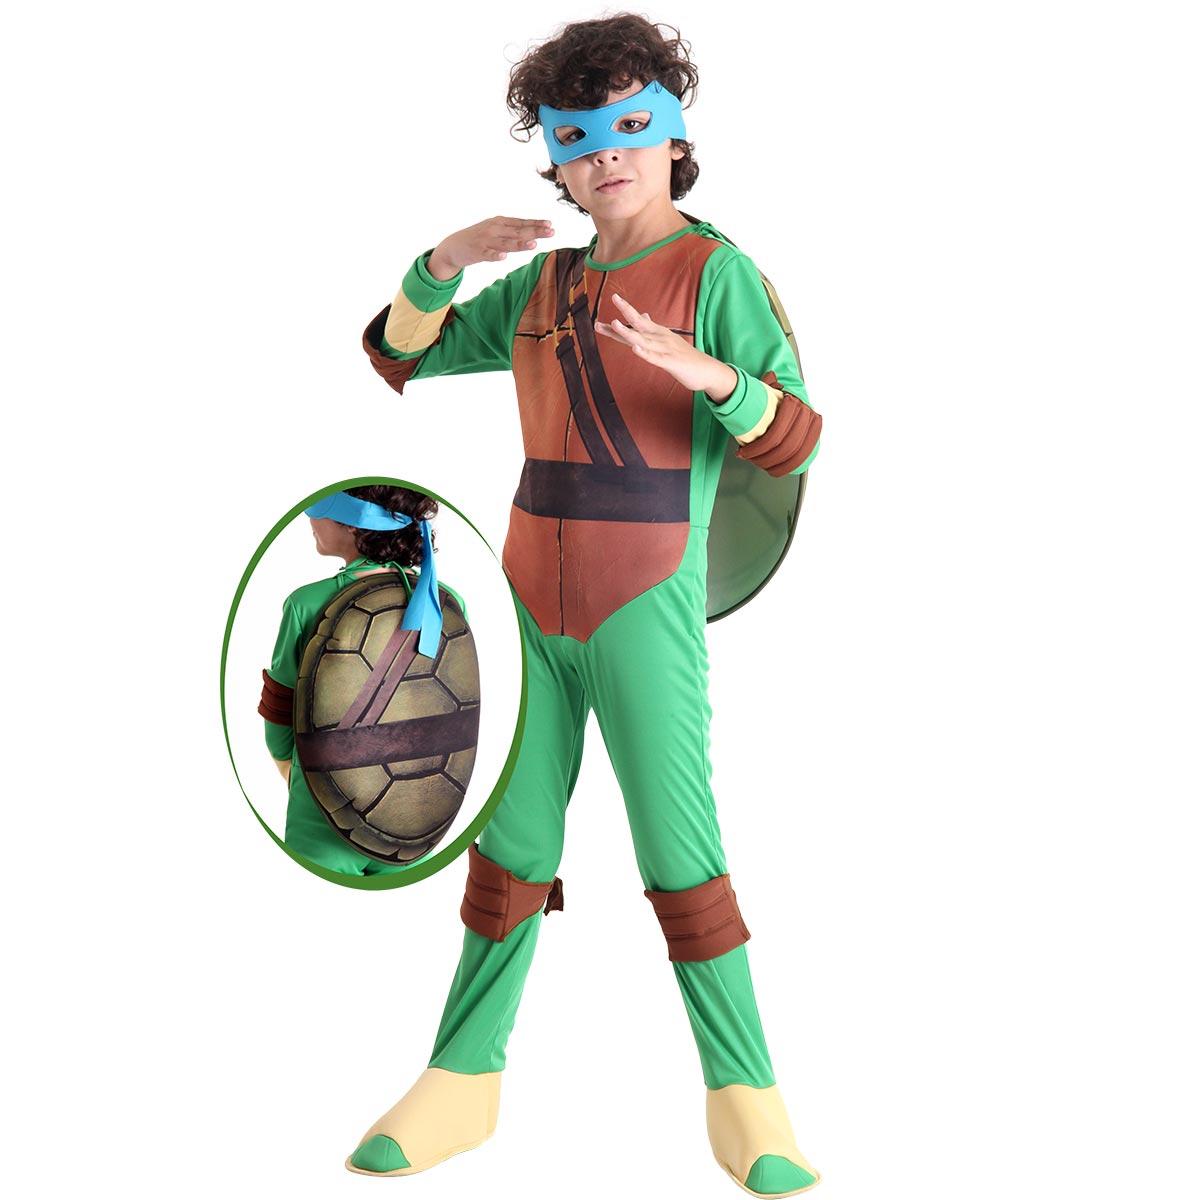 Fantasia tartarugas ninjas leonardo artigos para festas e fantasia tartarugas ninjas leonardo artigos para festas e fantasias curitiba isofestas curitiba thecheapjerseys Image collections